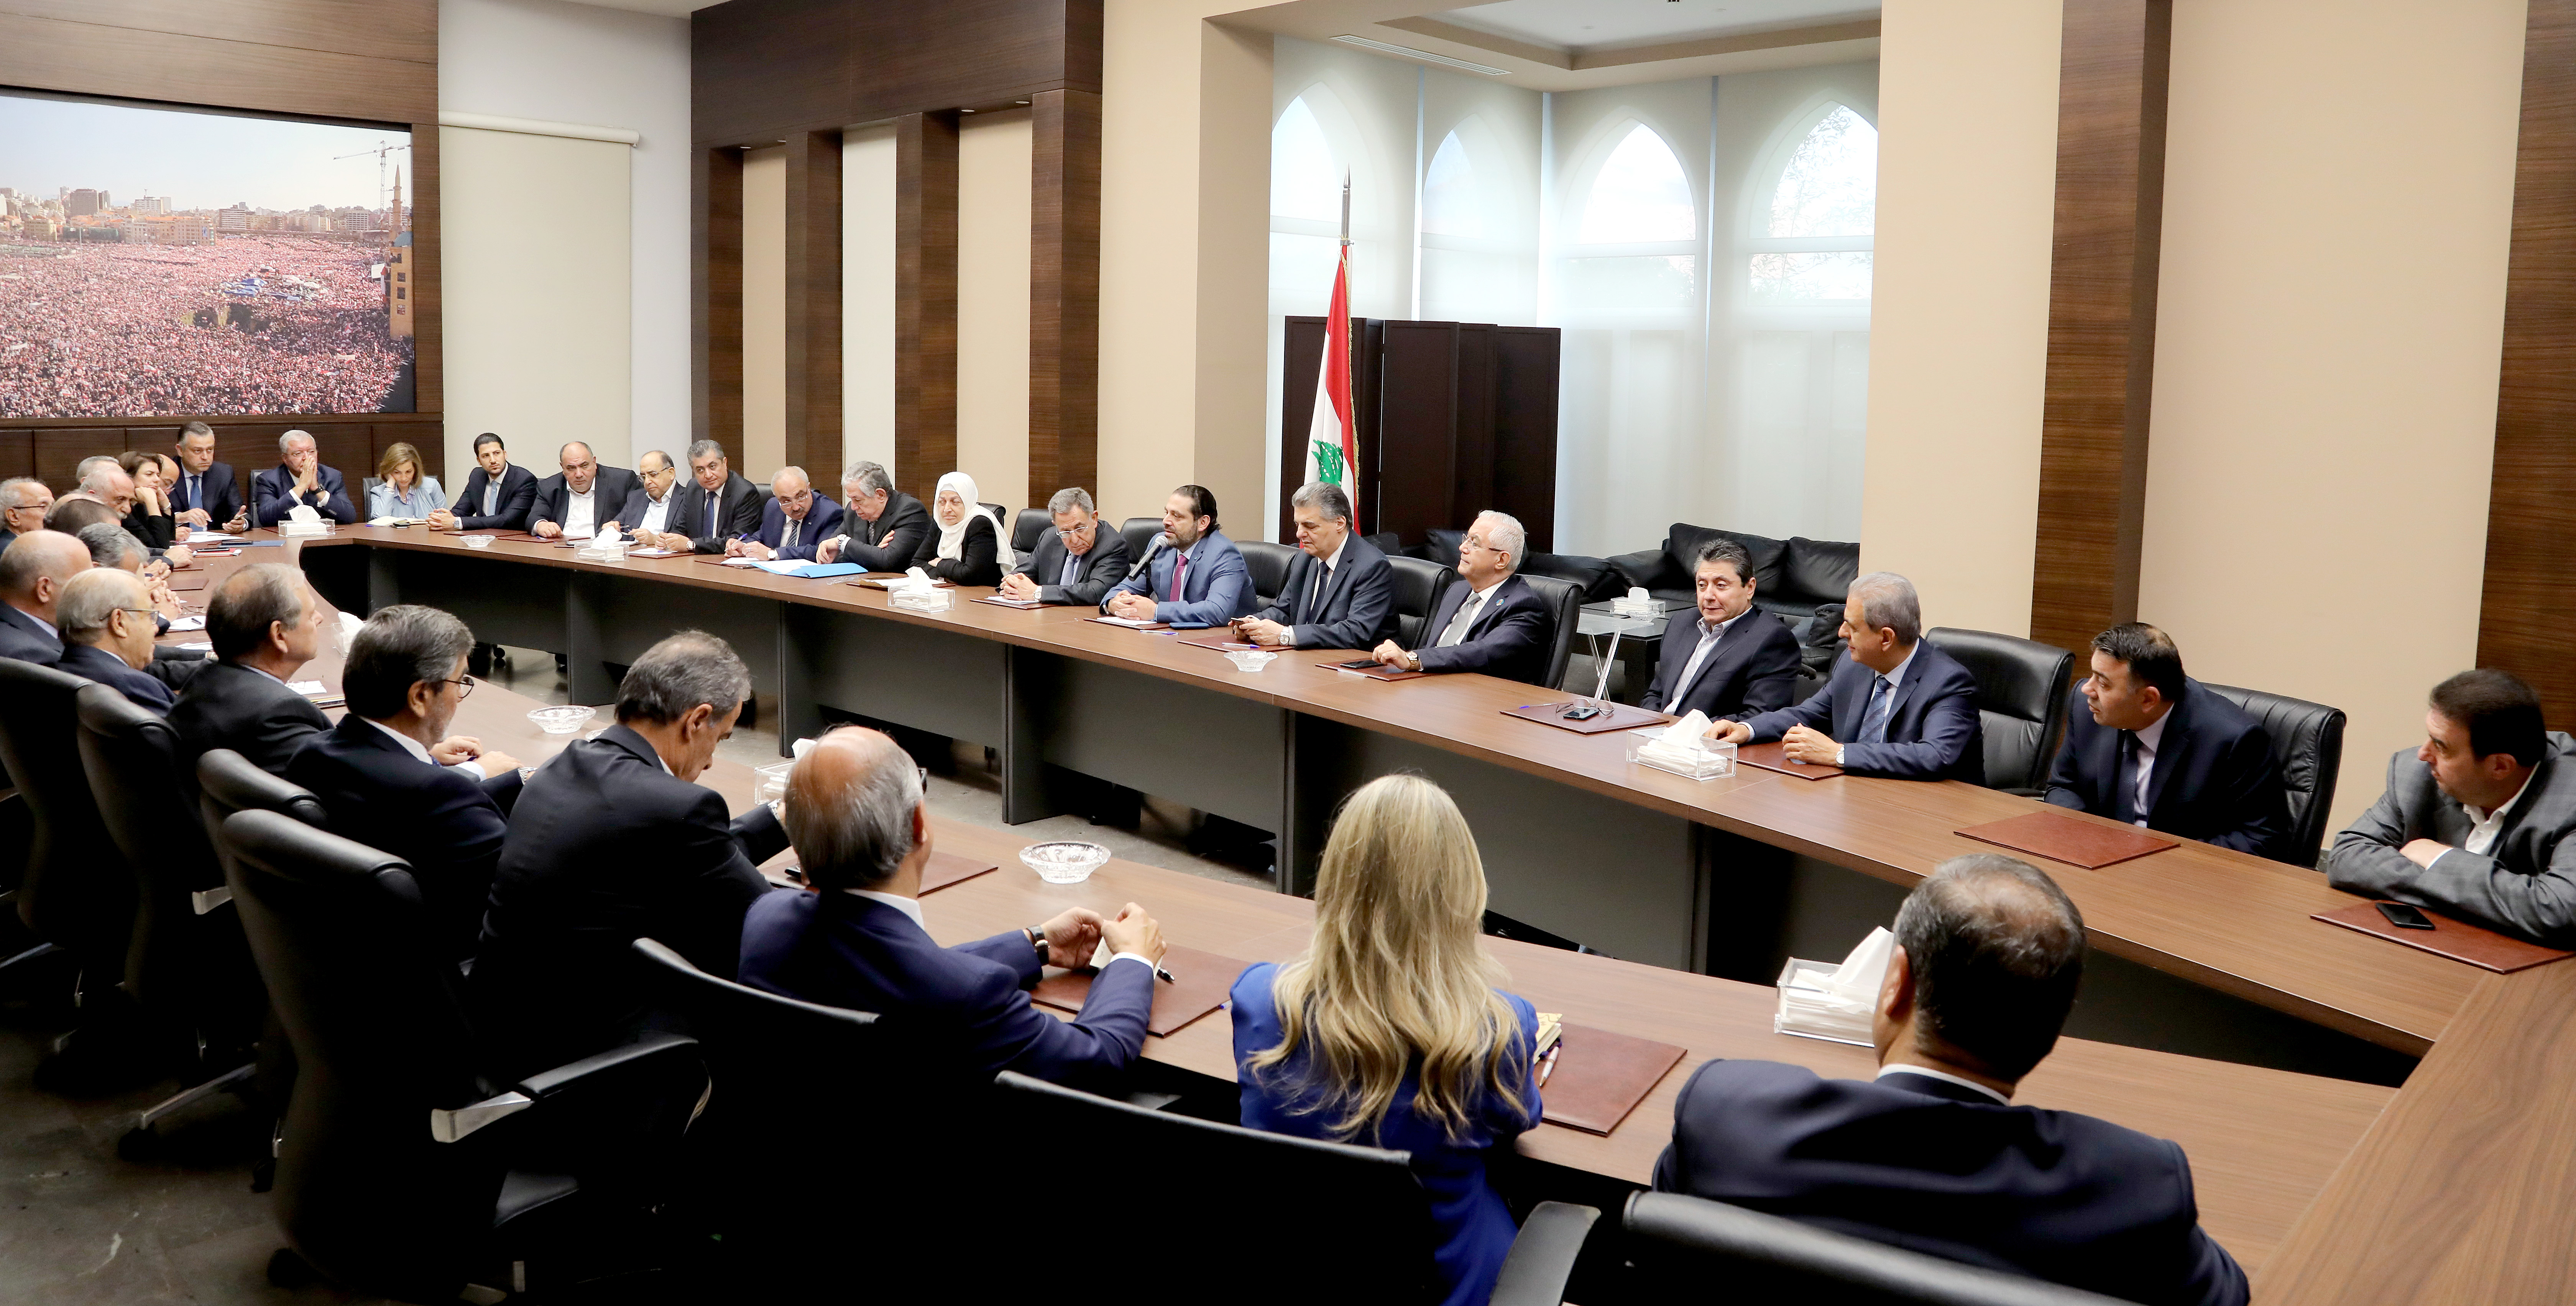 Pr Minister Saad Hariri Heading Almustaqbal MP Bloc 6